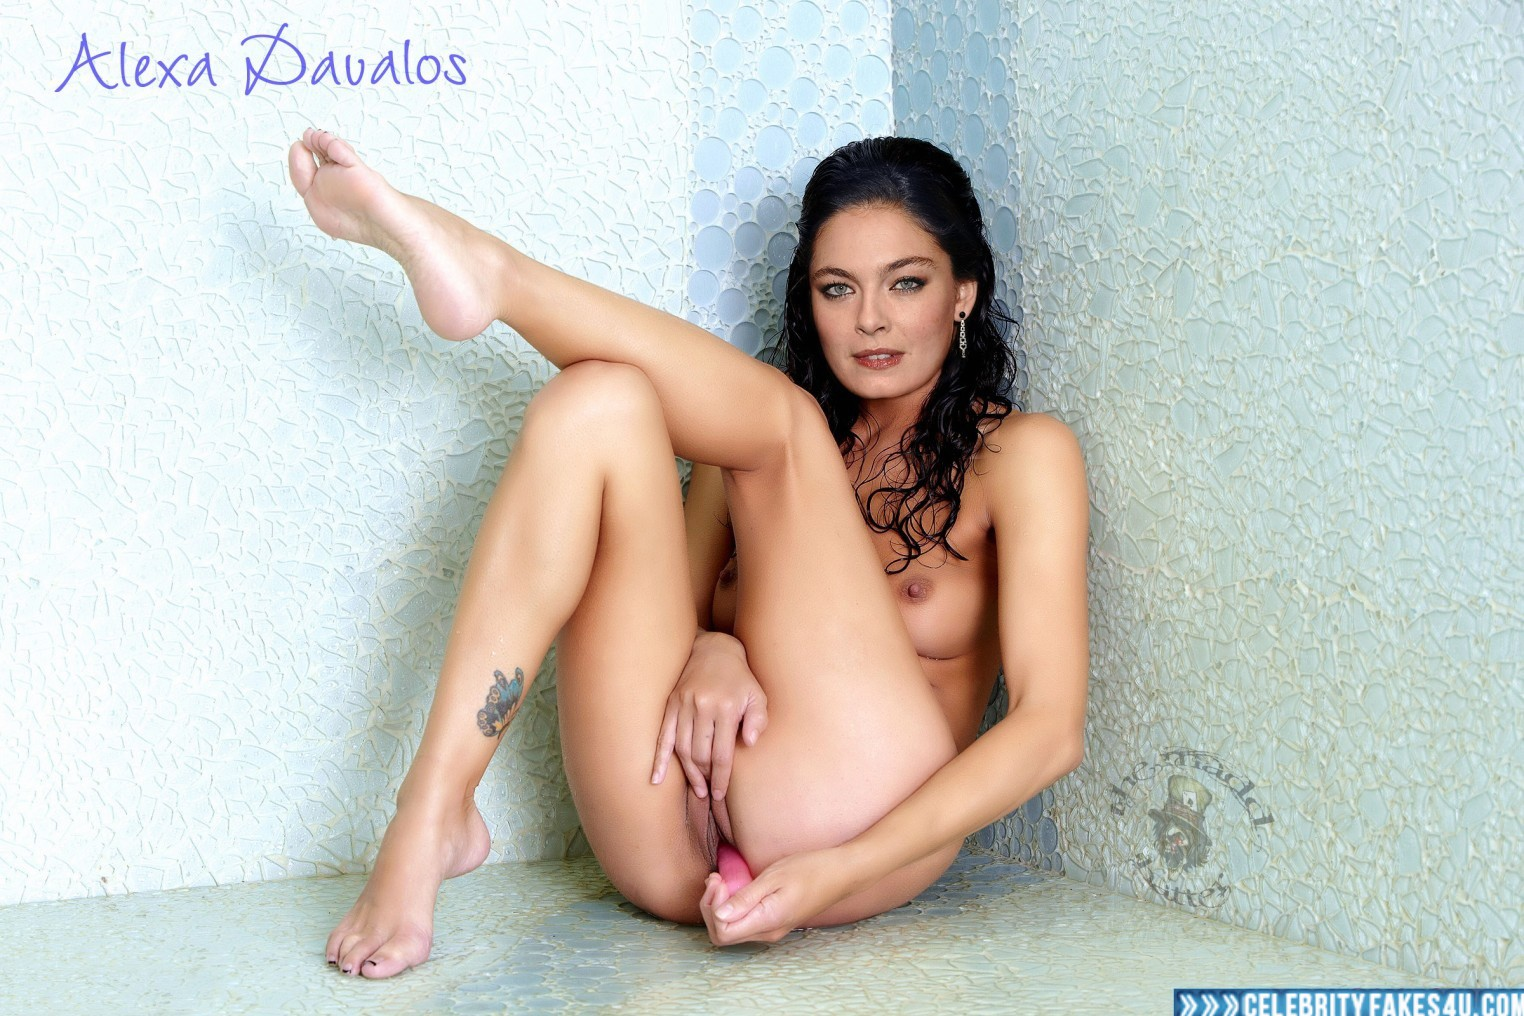 Danica patrick nude screensaver